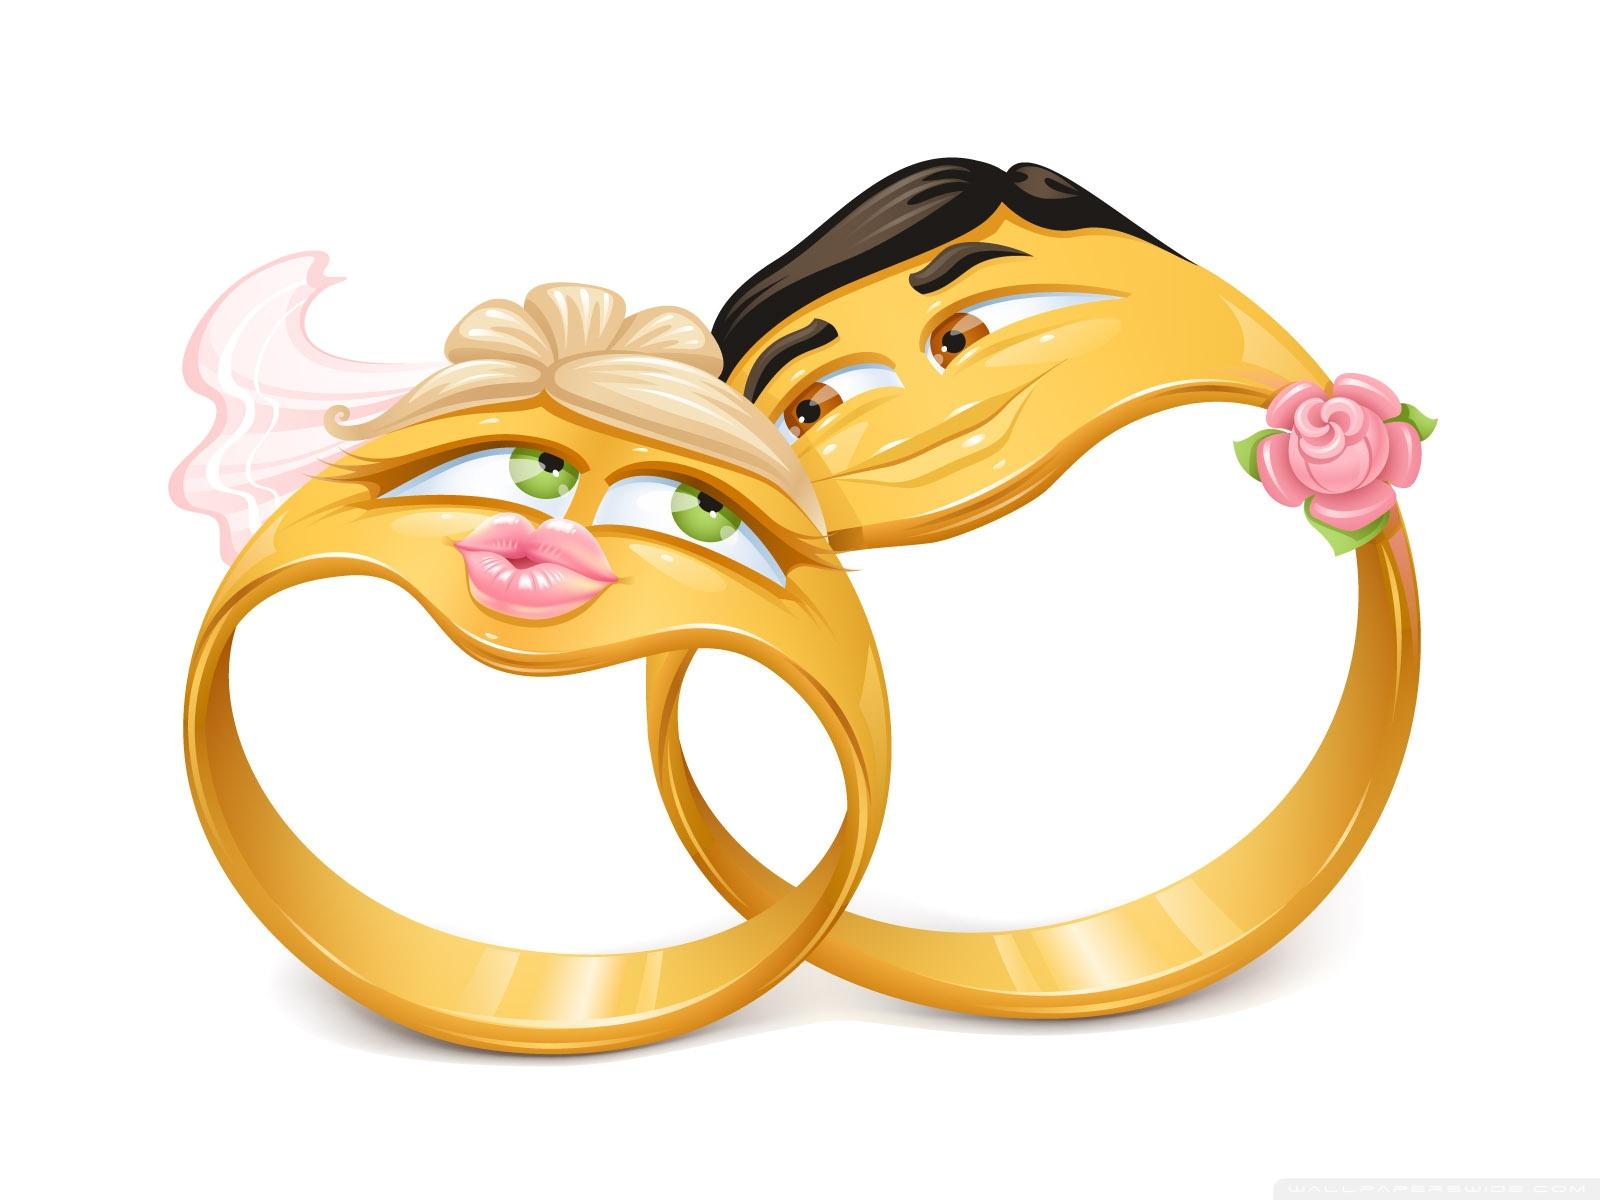 wedding rings wallpapers wedding rings pictures Standard